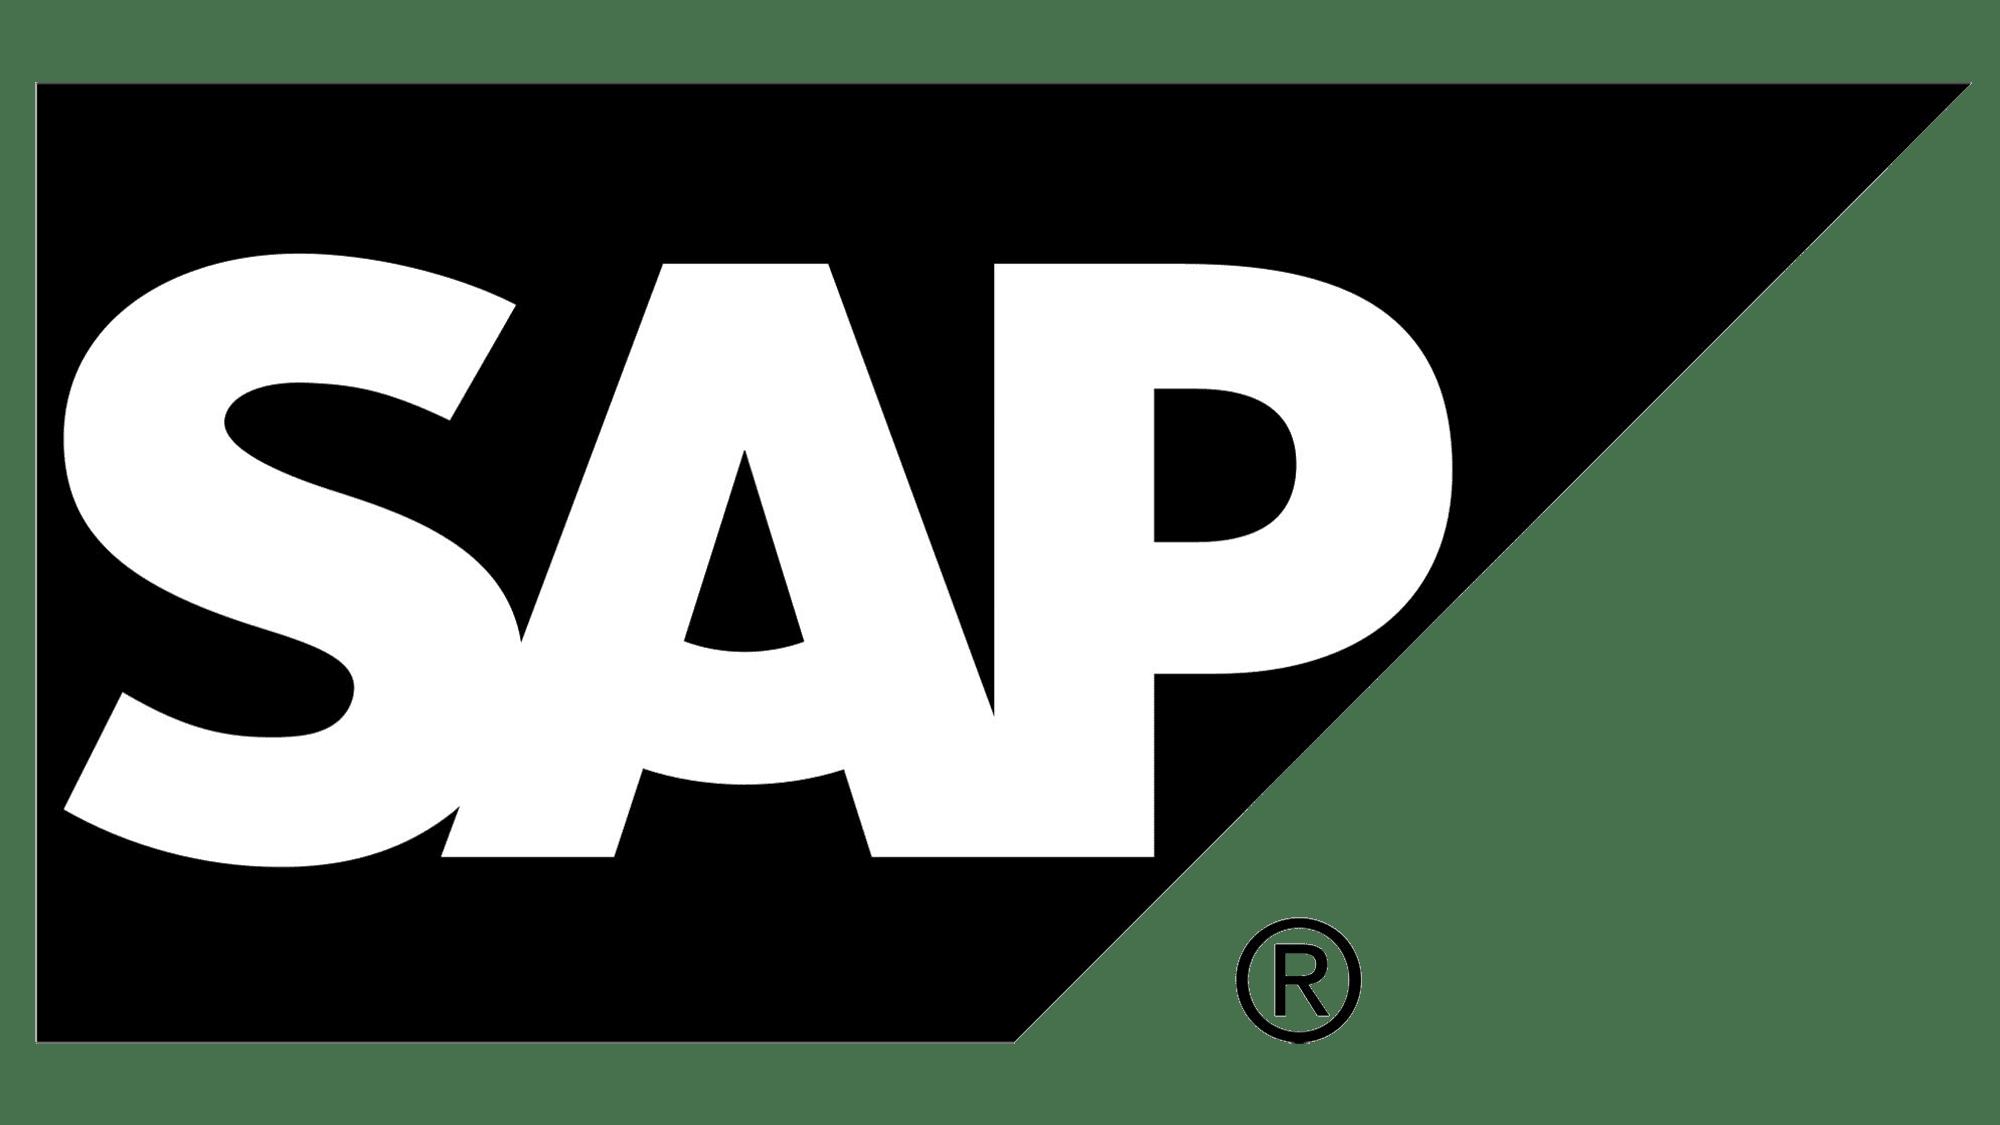 SAP Emblem